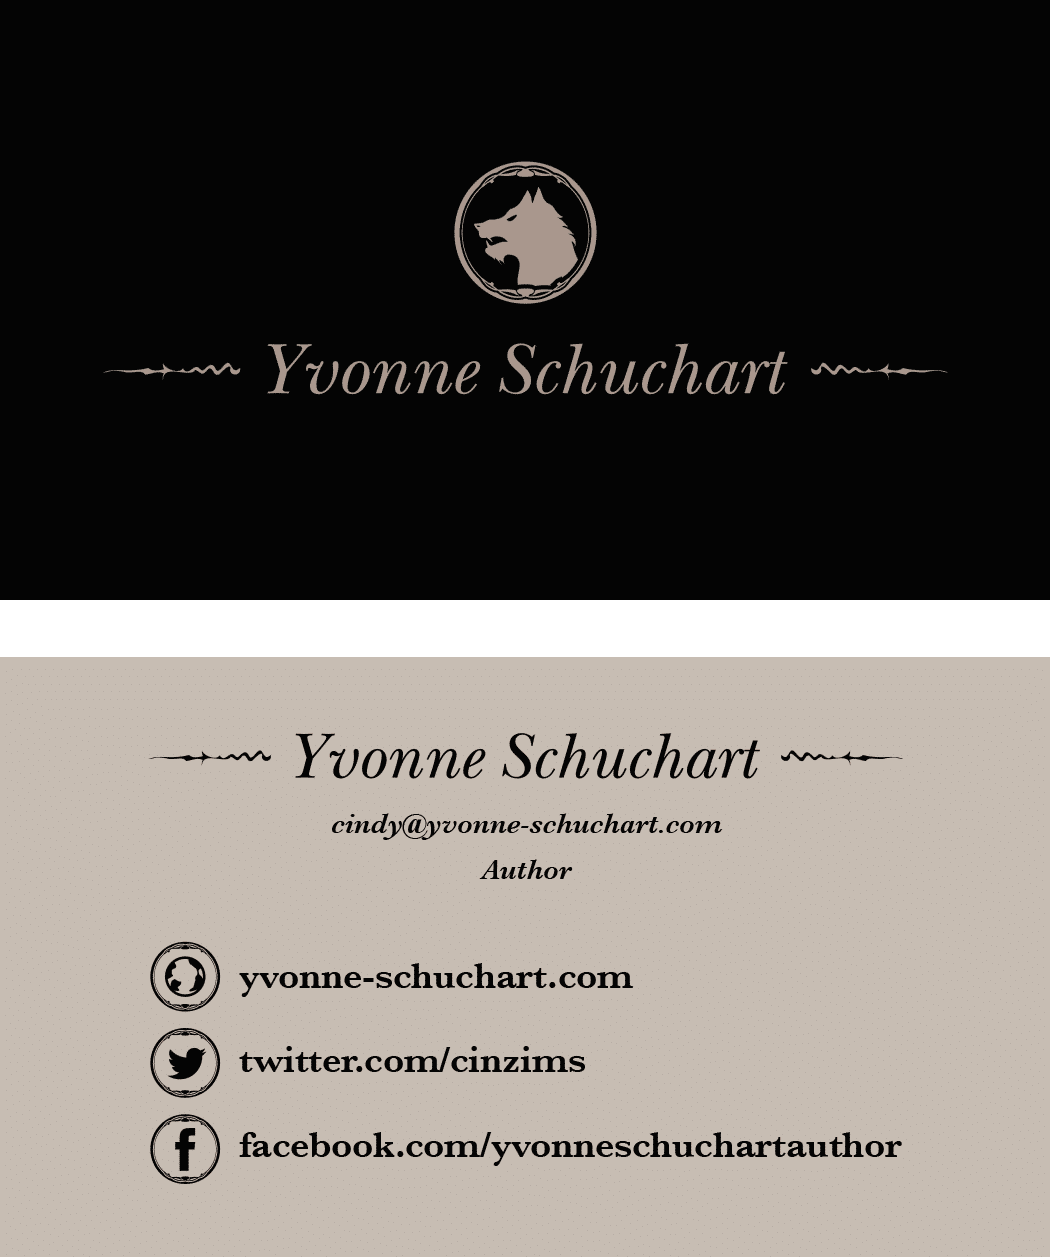 Yvonne Schuchart Business Card Design